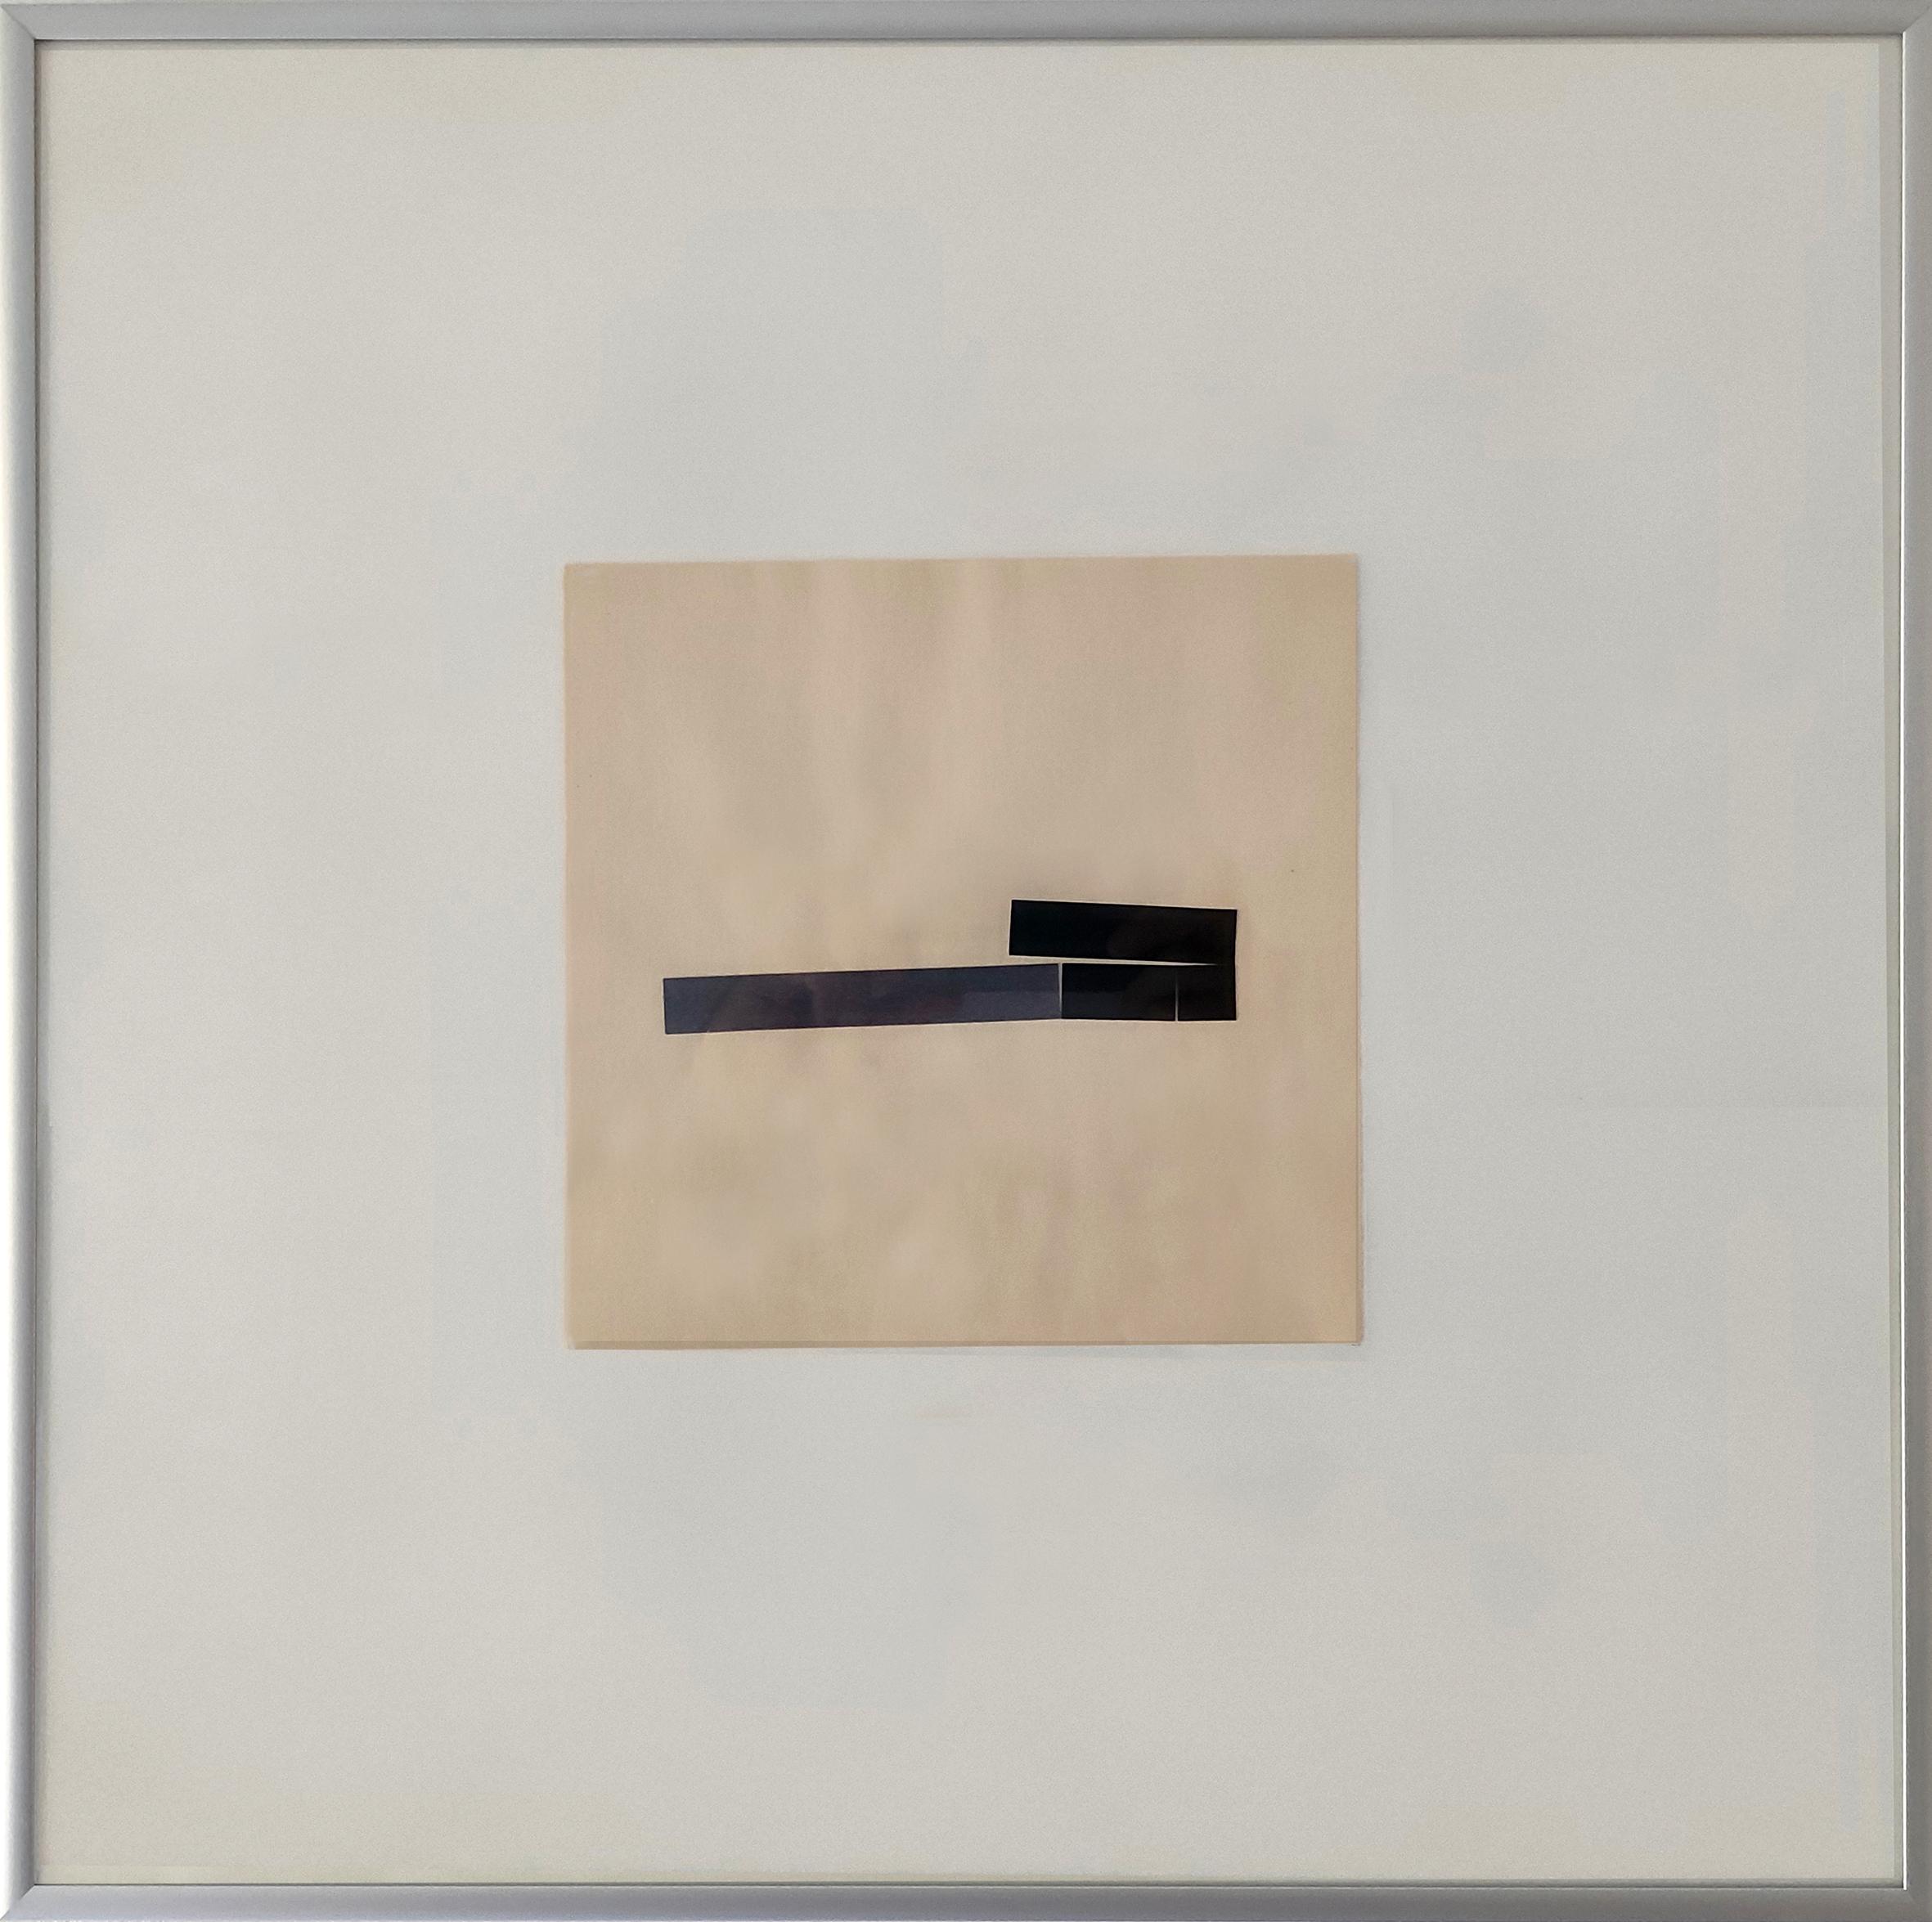 Diet Sayler, Capriccio 1983:06:10-4, Collage auf Bütten, 21x21 cm | Alu 50x50 cm